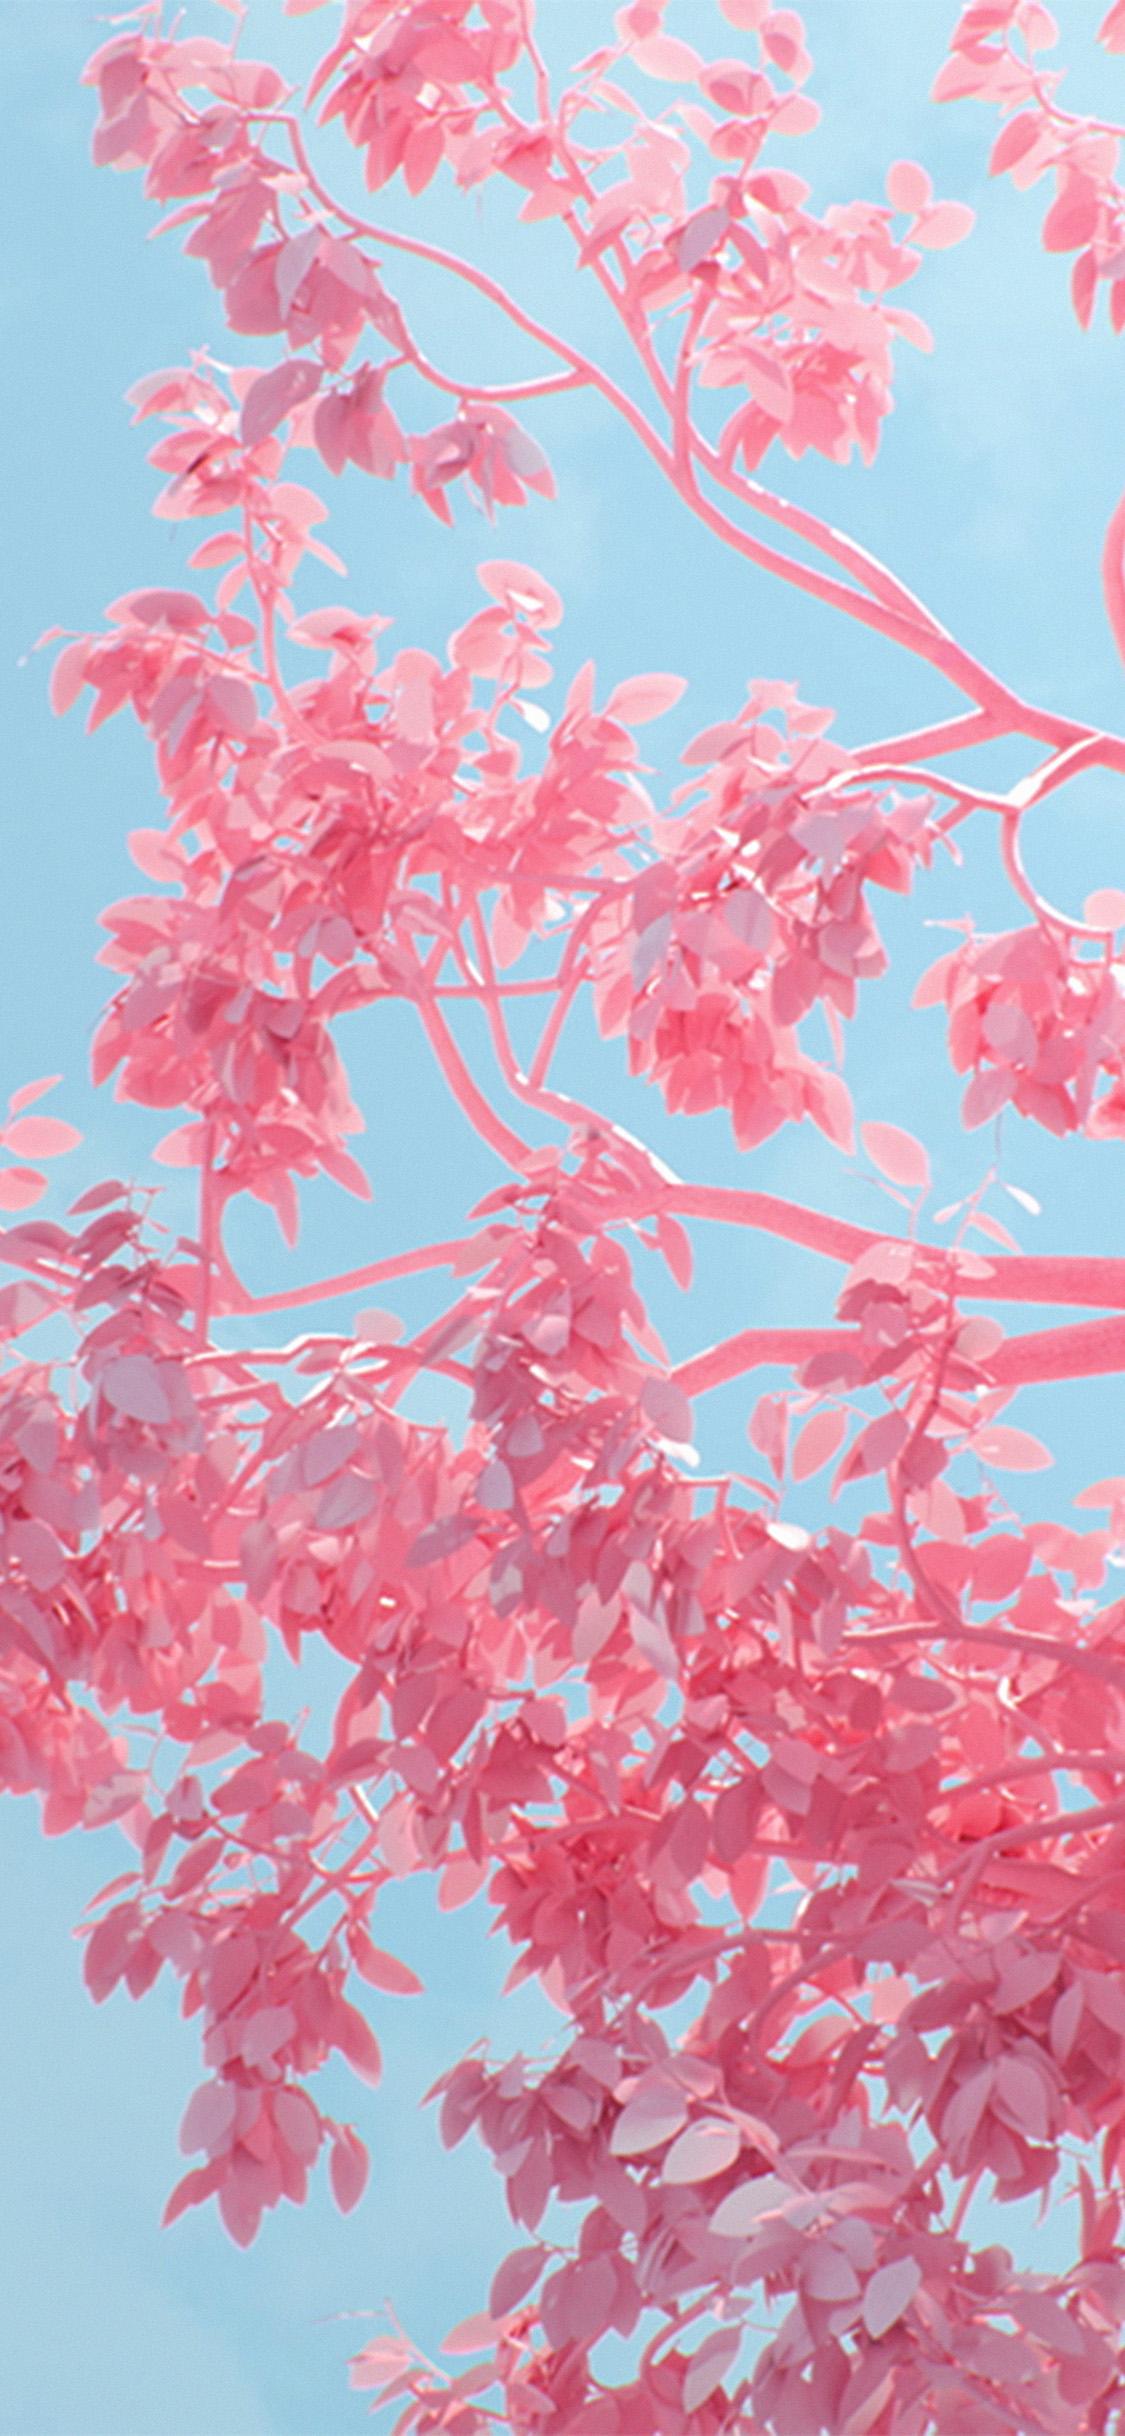 iPhonexpapers.com-Apple-iPhone-wallpaper-be25-tree-pink-spring-digital-art-illustration